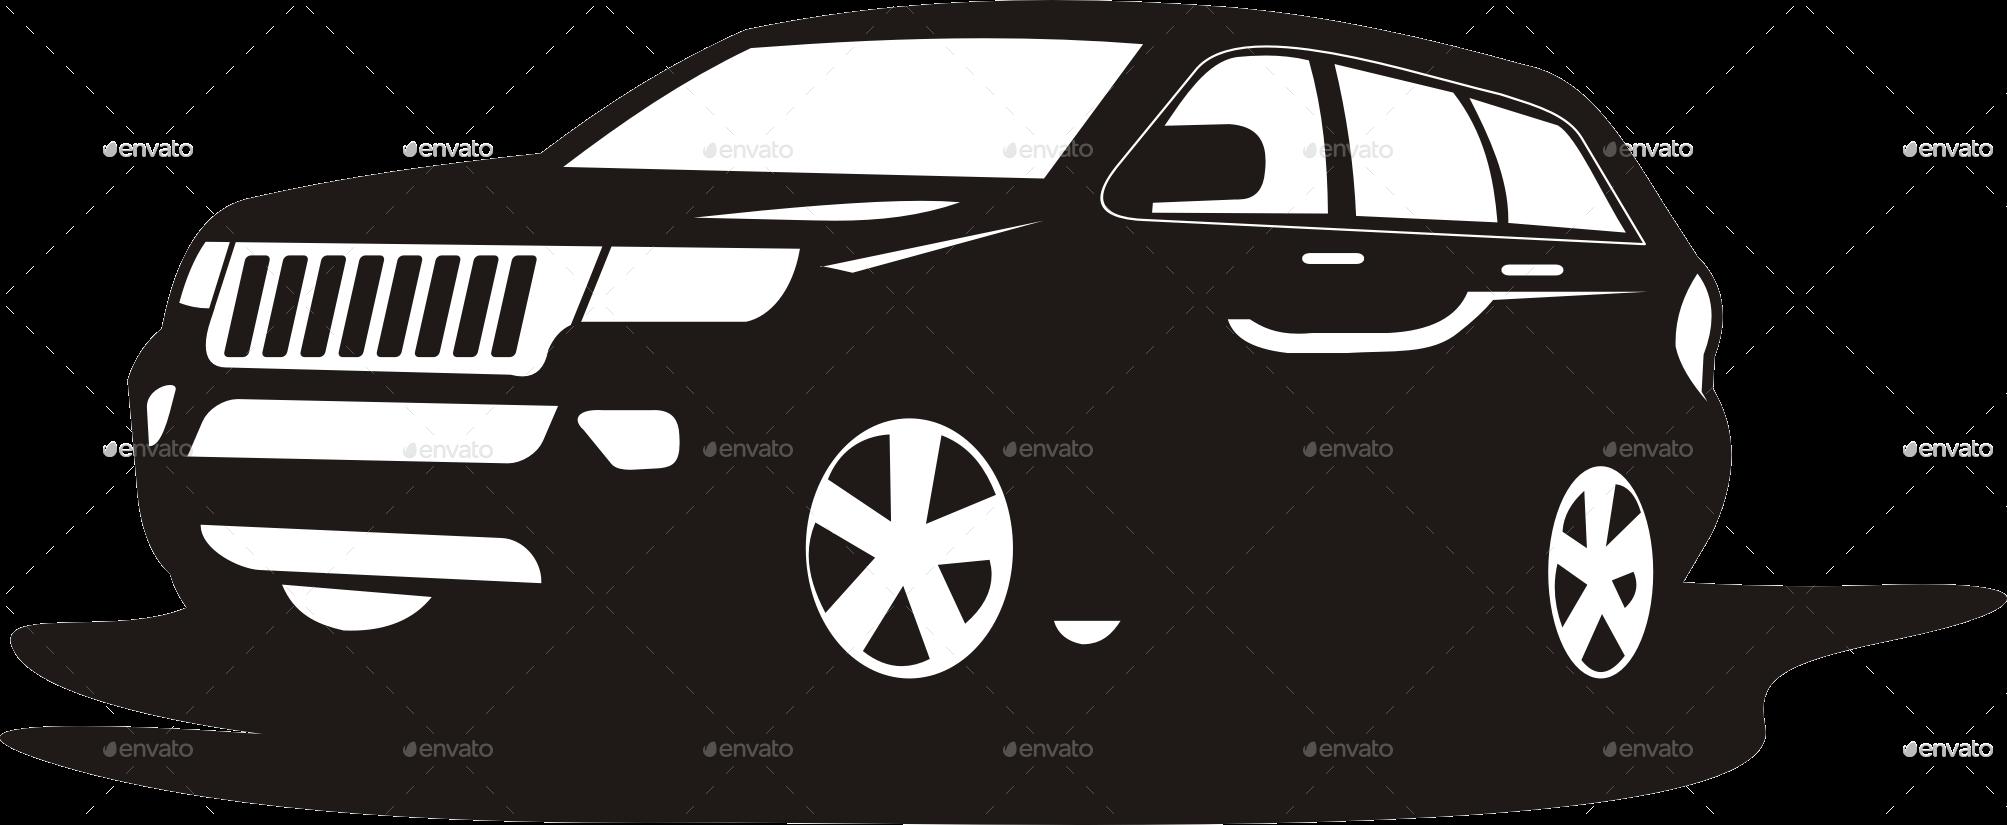 suv car logo template by yokoz graphicriver. Black Bedroom Furniture Sets. Home Design Ideas